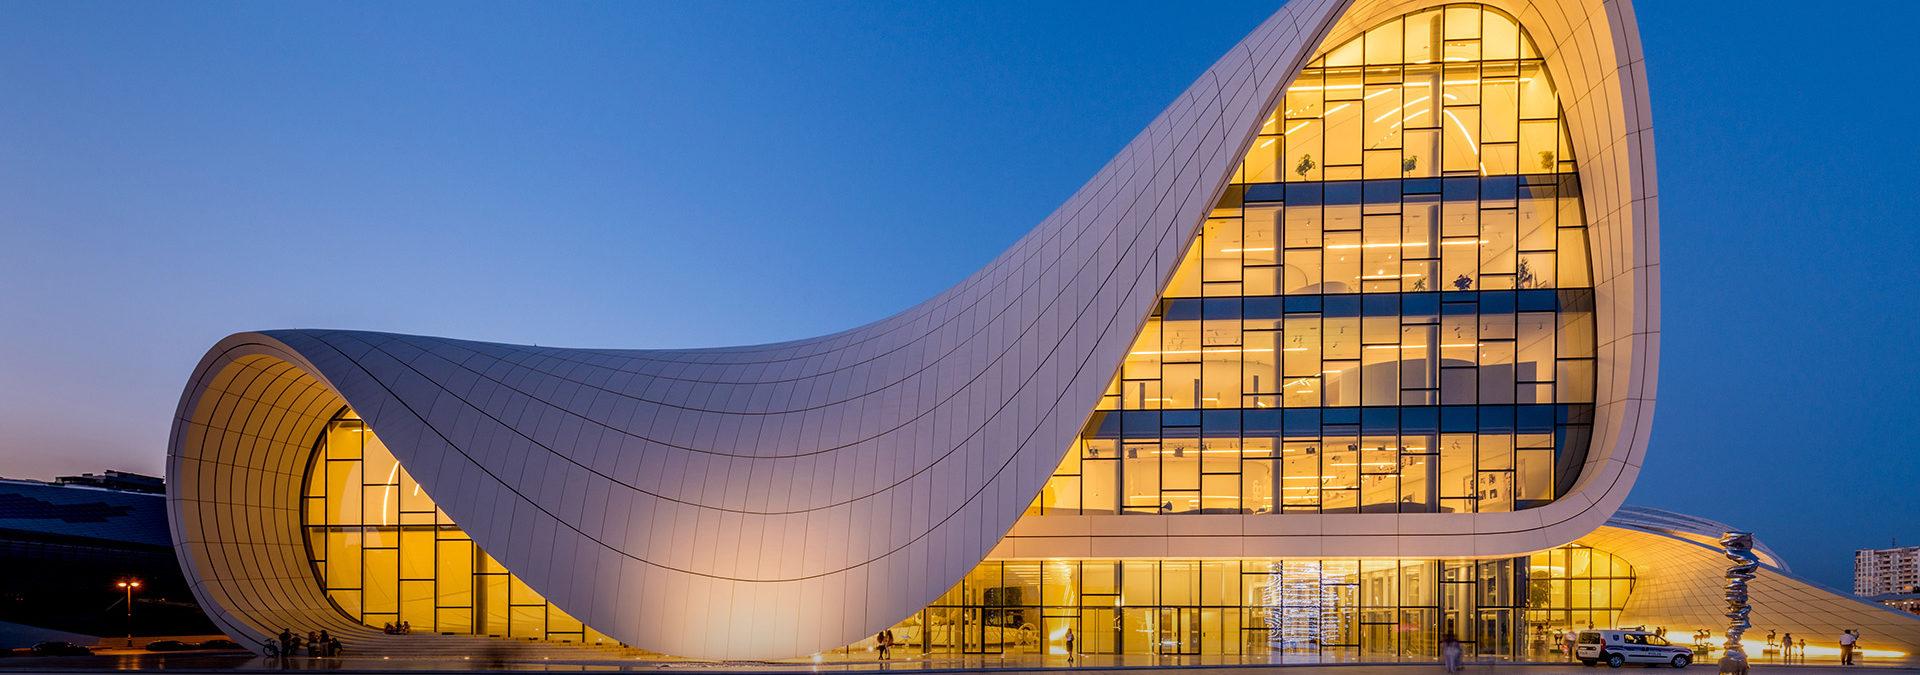 Top 10 Architecture Buildings Unique In China